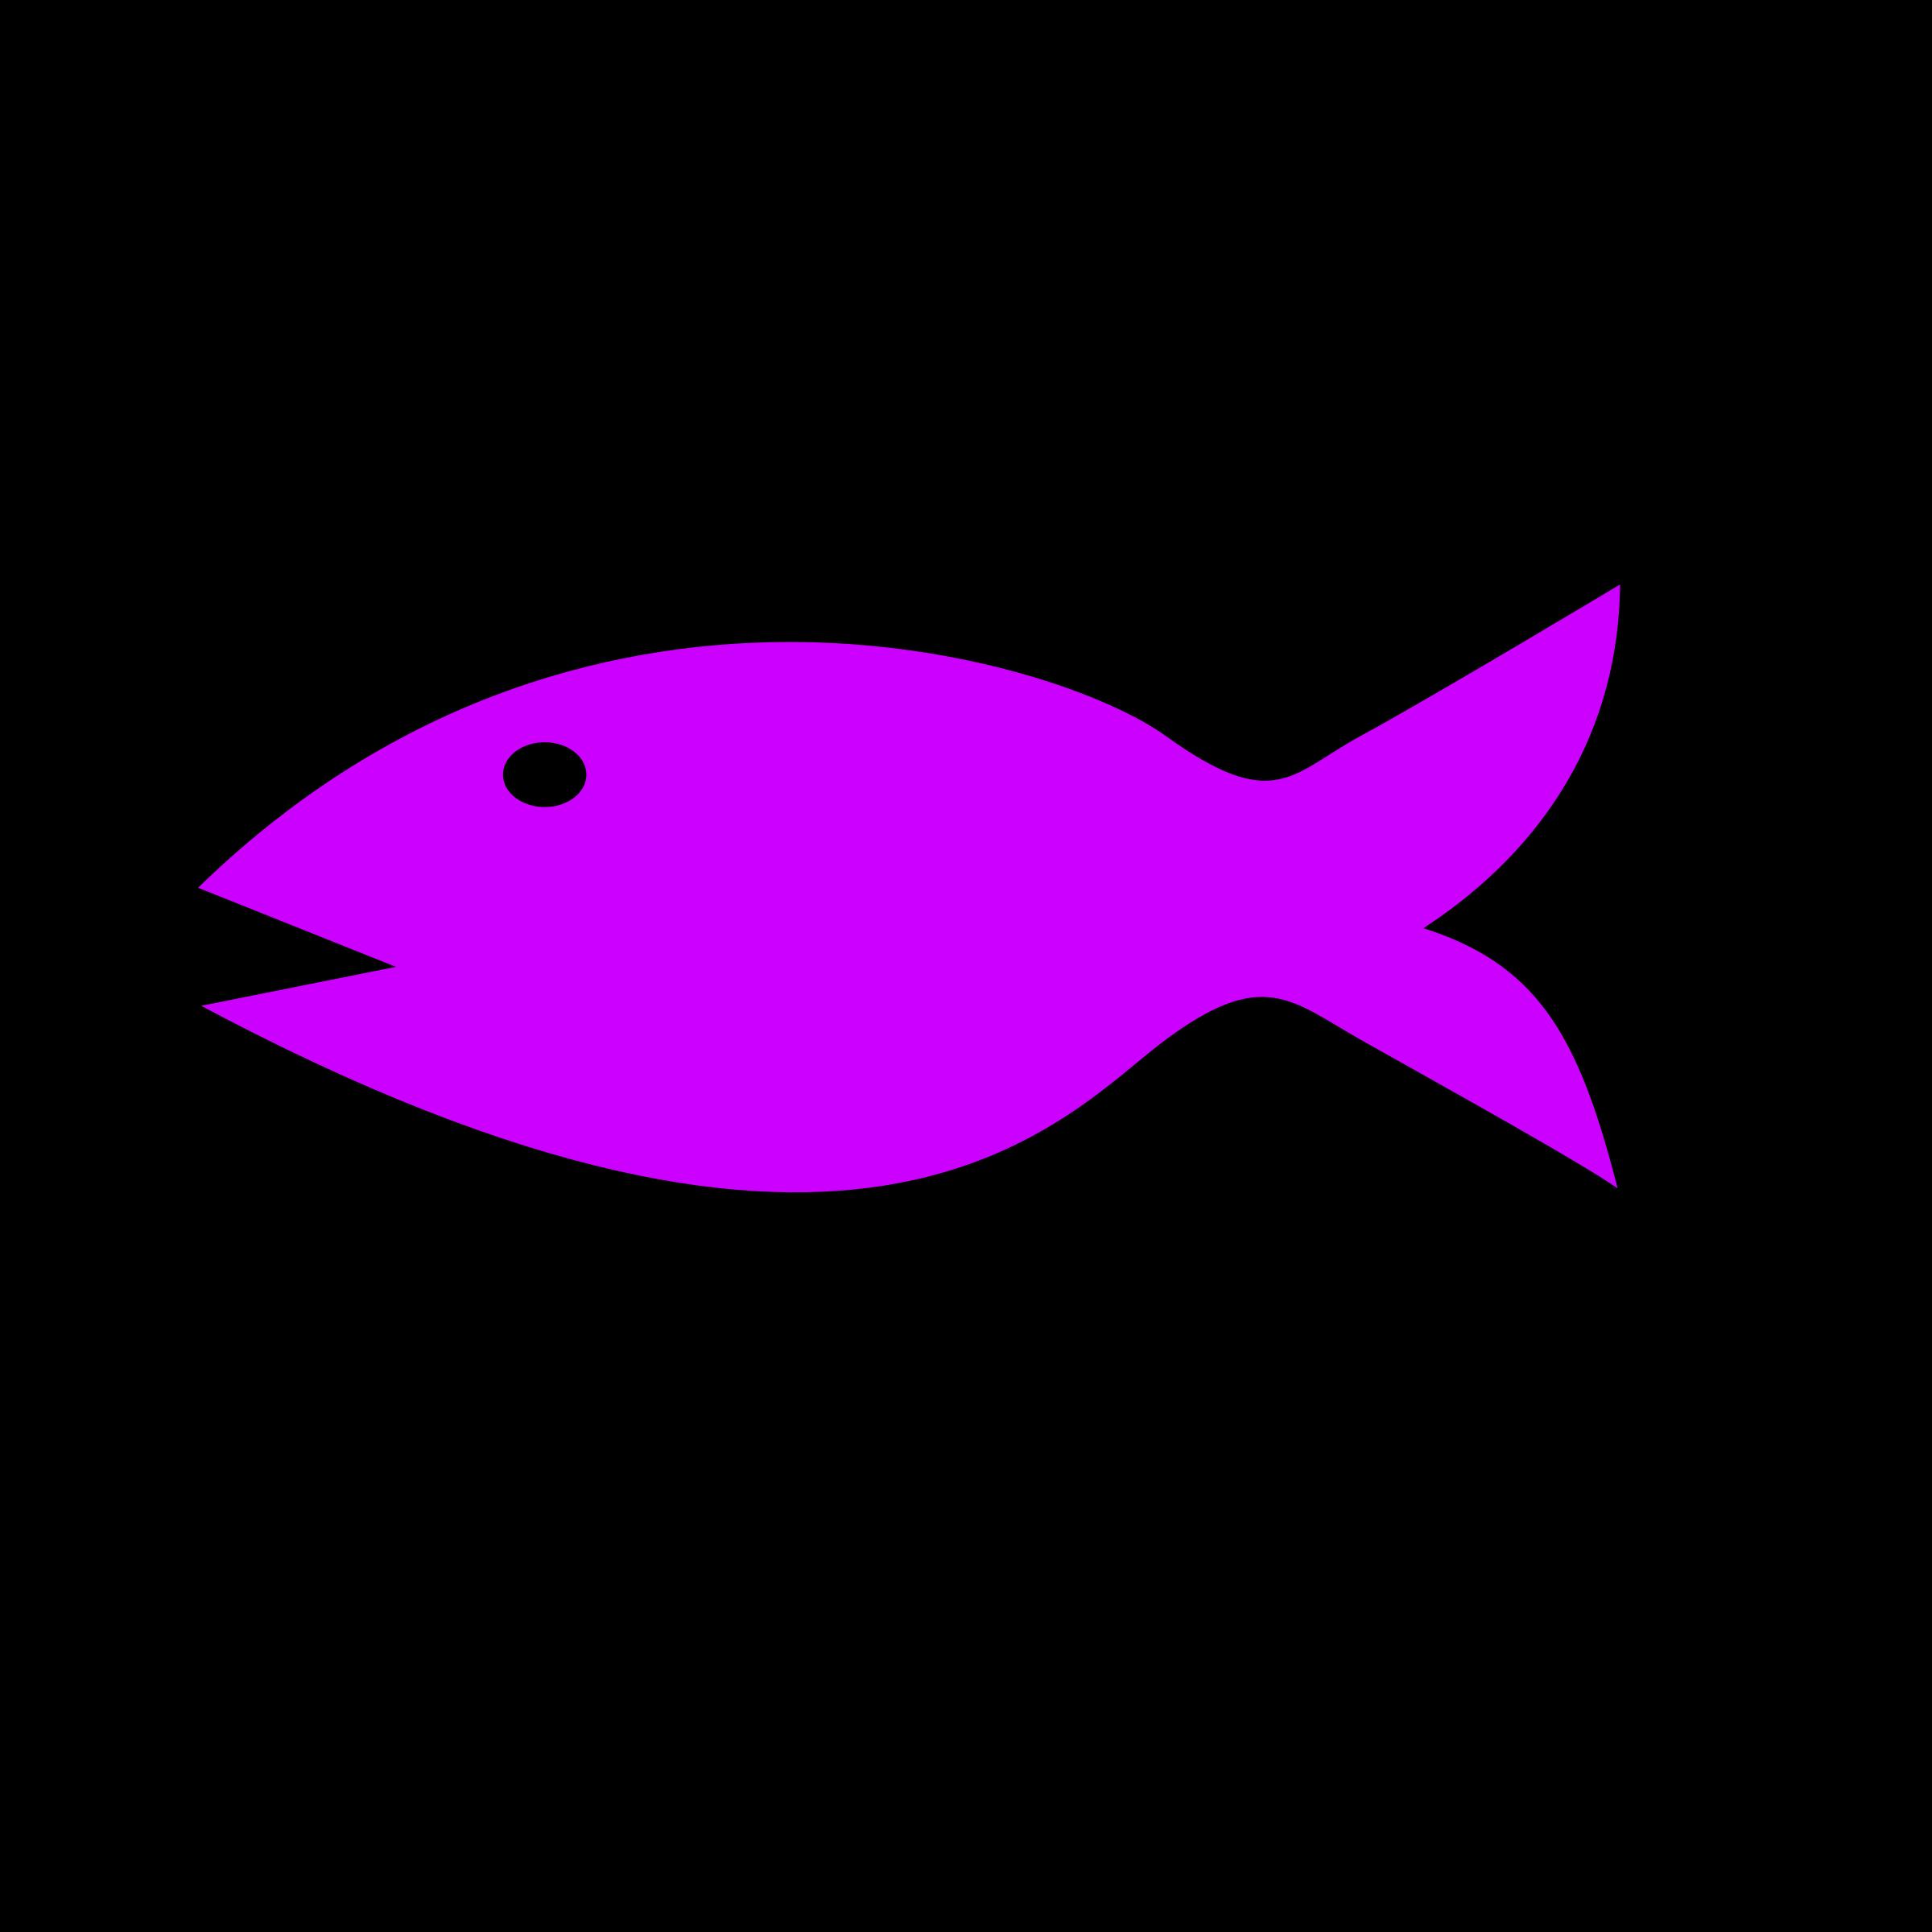 Summer fish clipart vector Clipart - Piecepack seasons suites - Summer vector